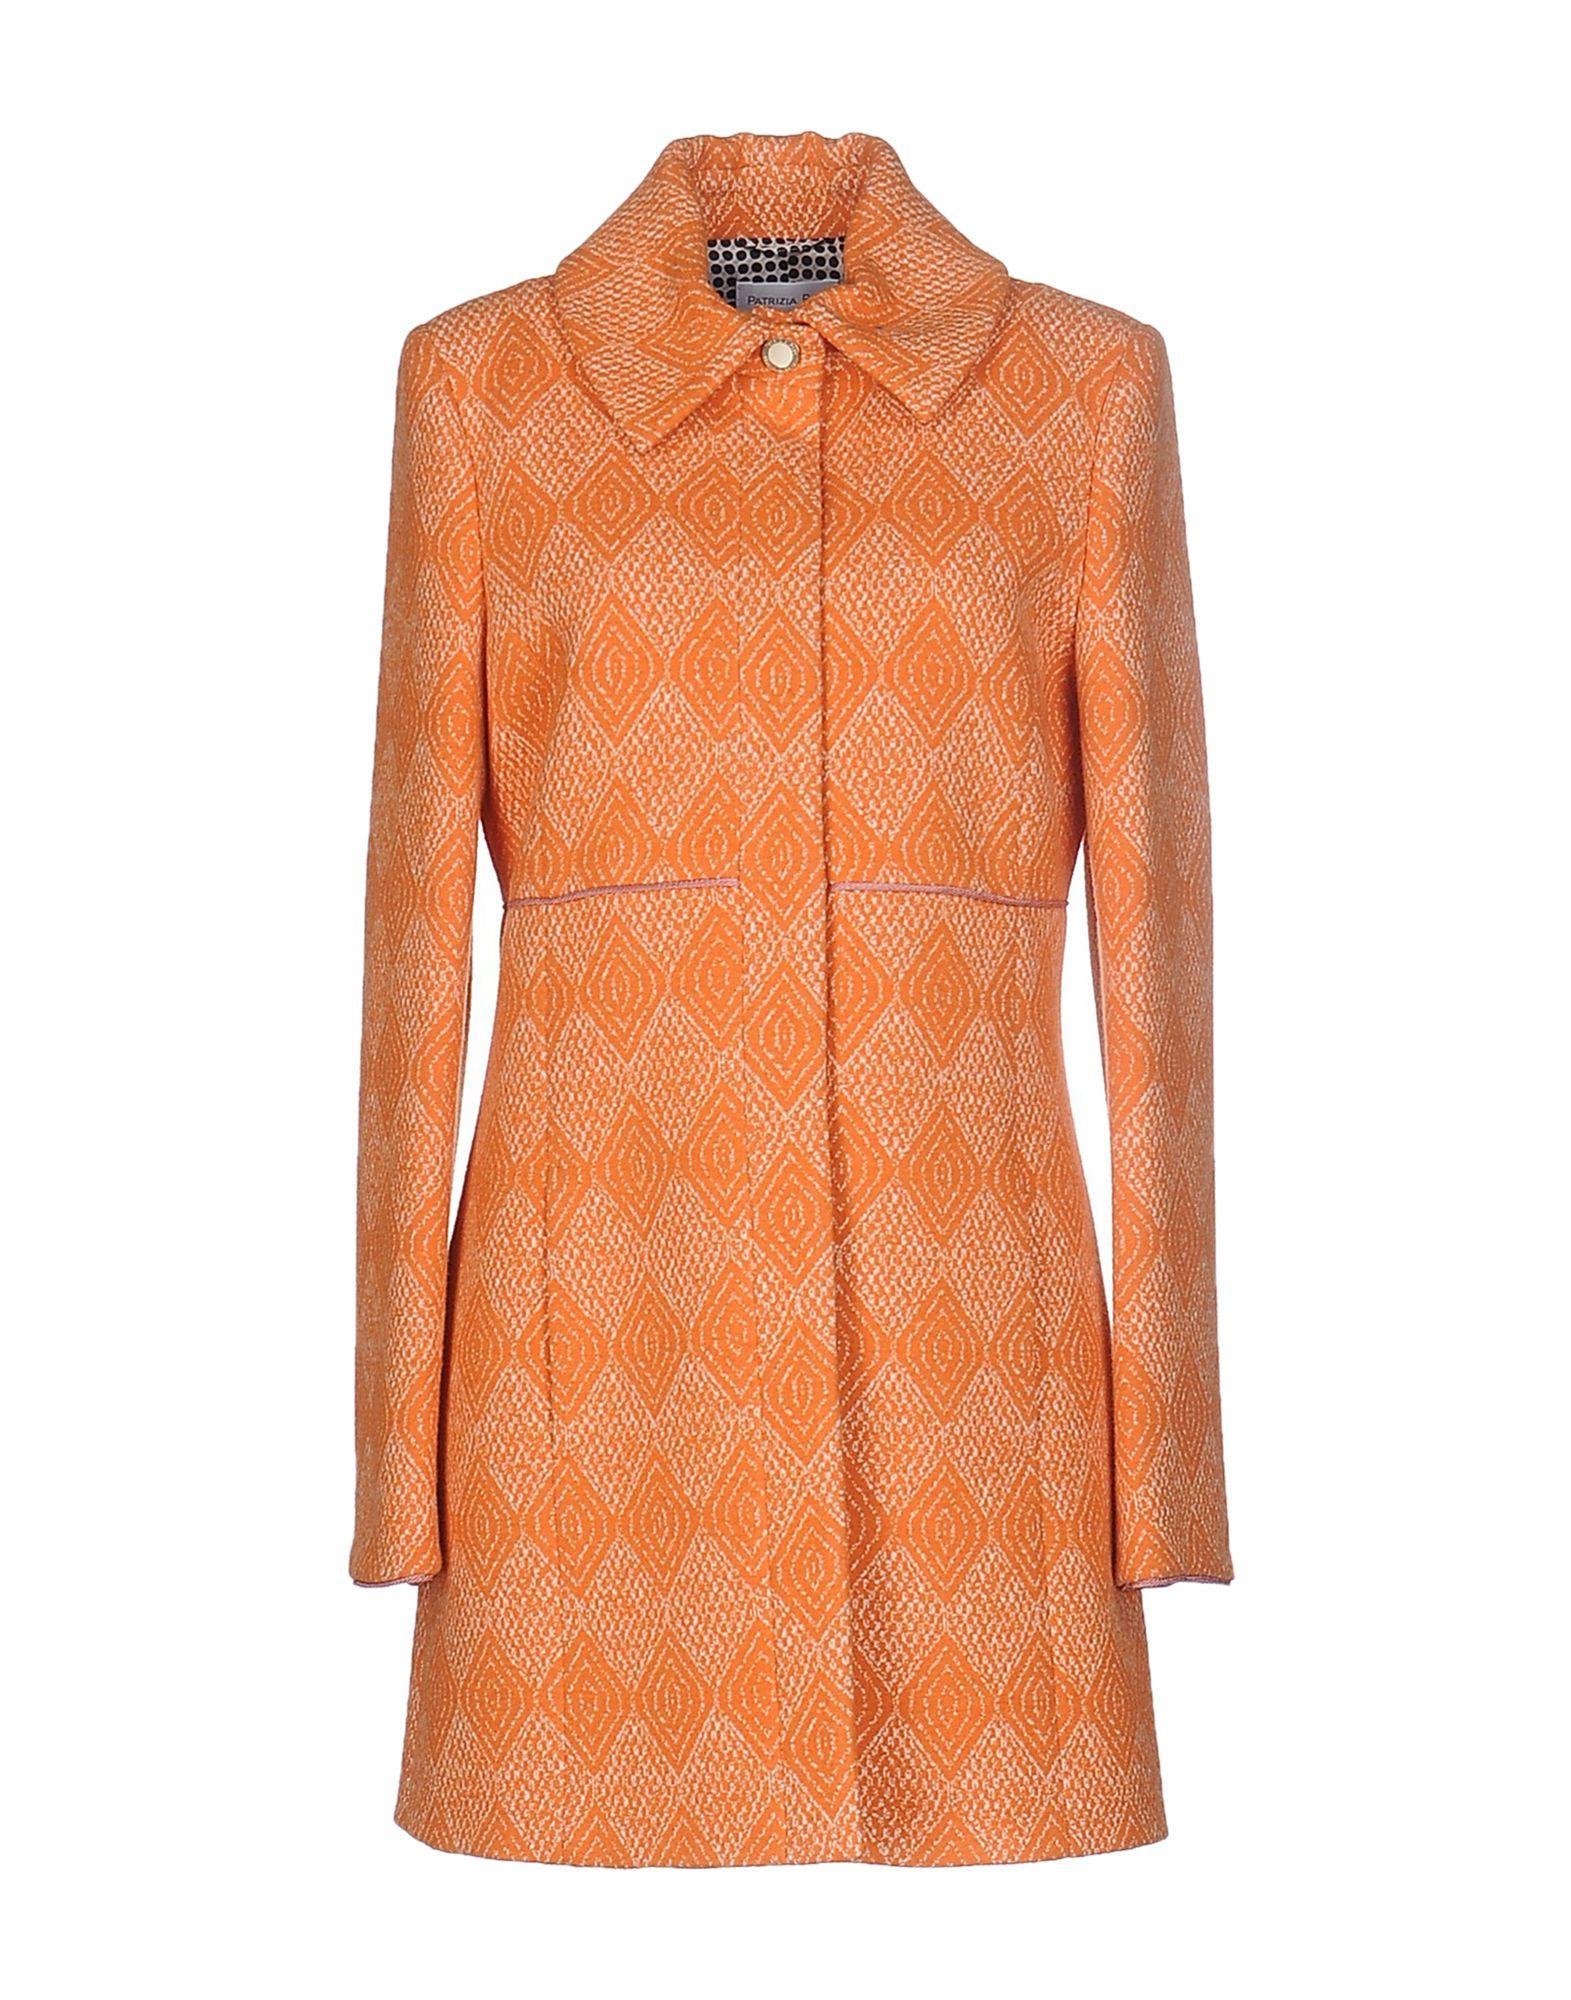 Patrizia Pepe Coats In Orange